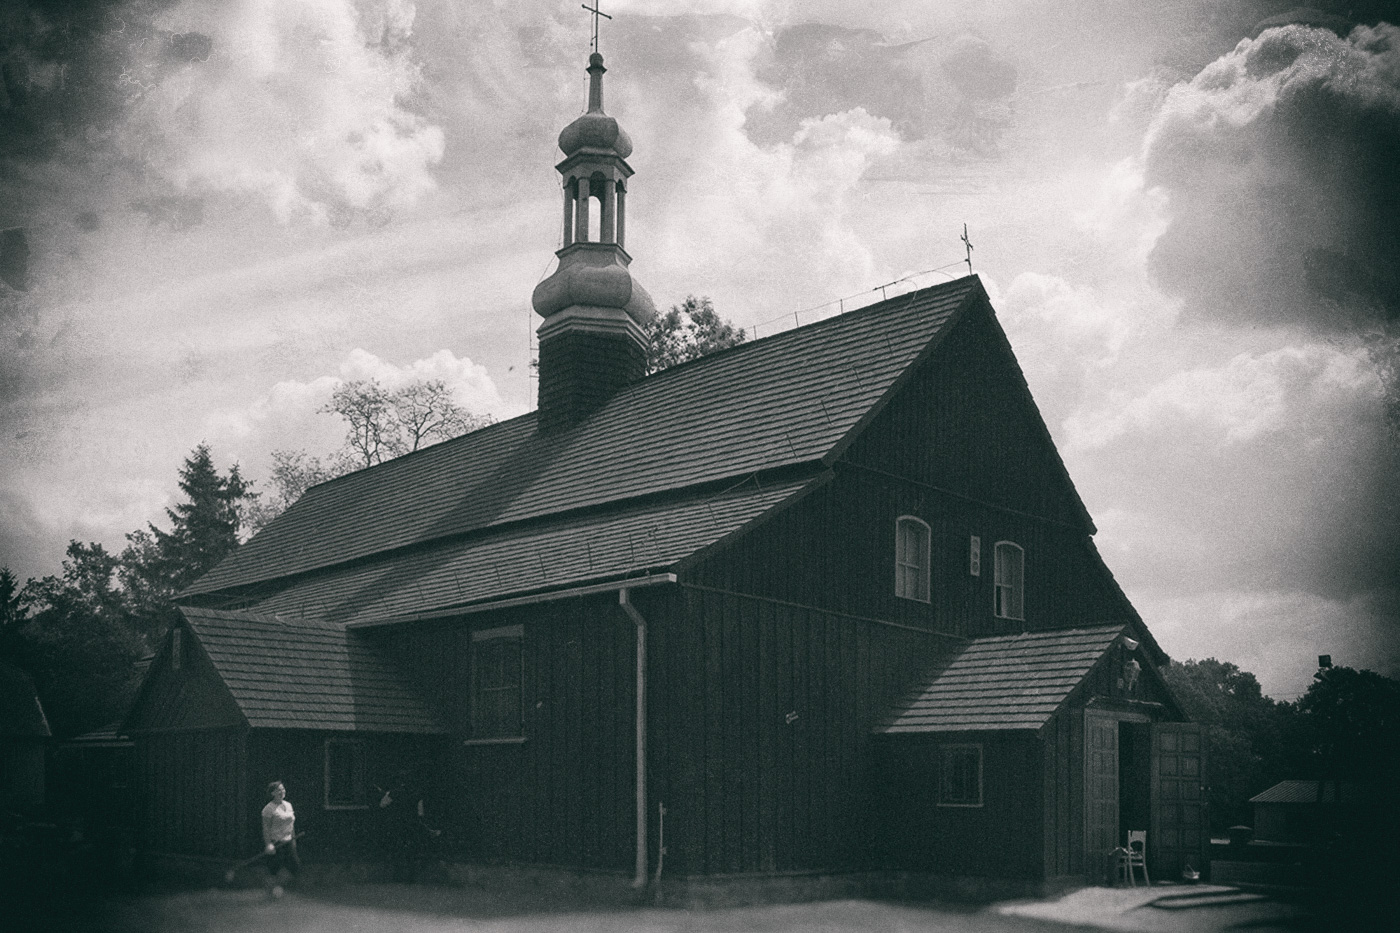 koscieszki-widok-front